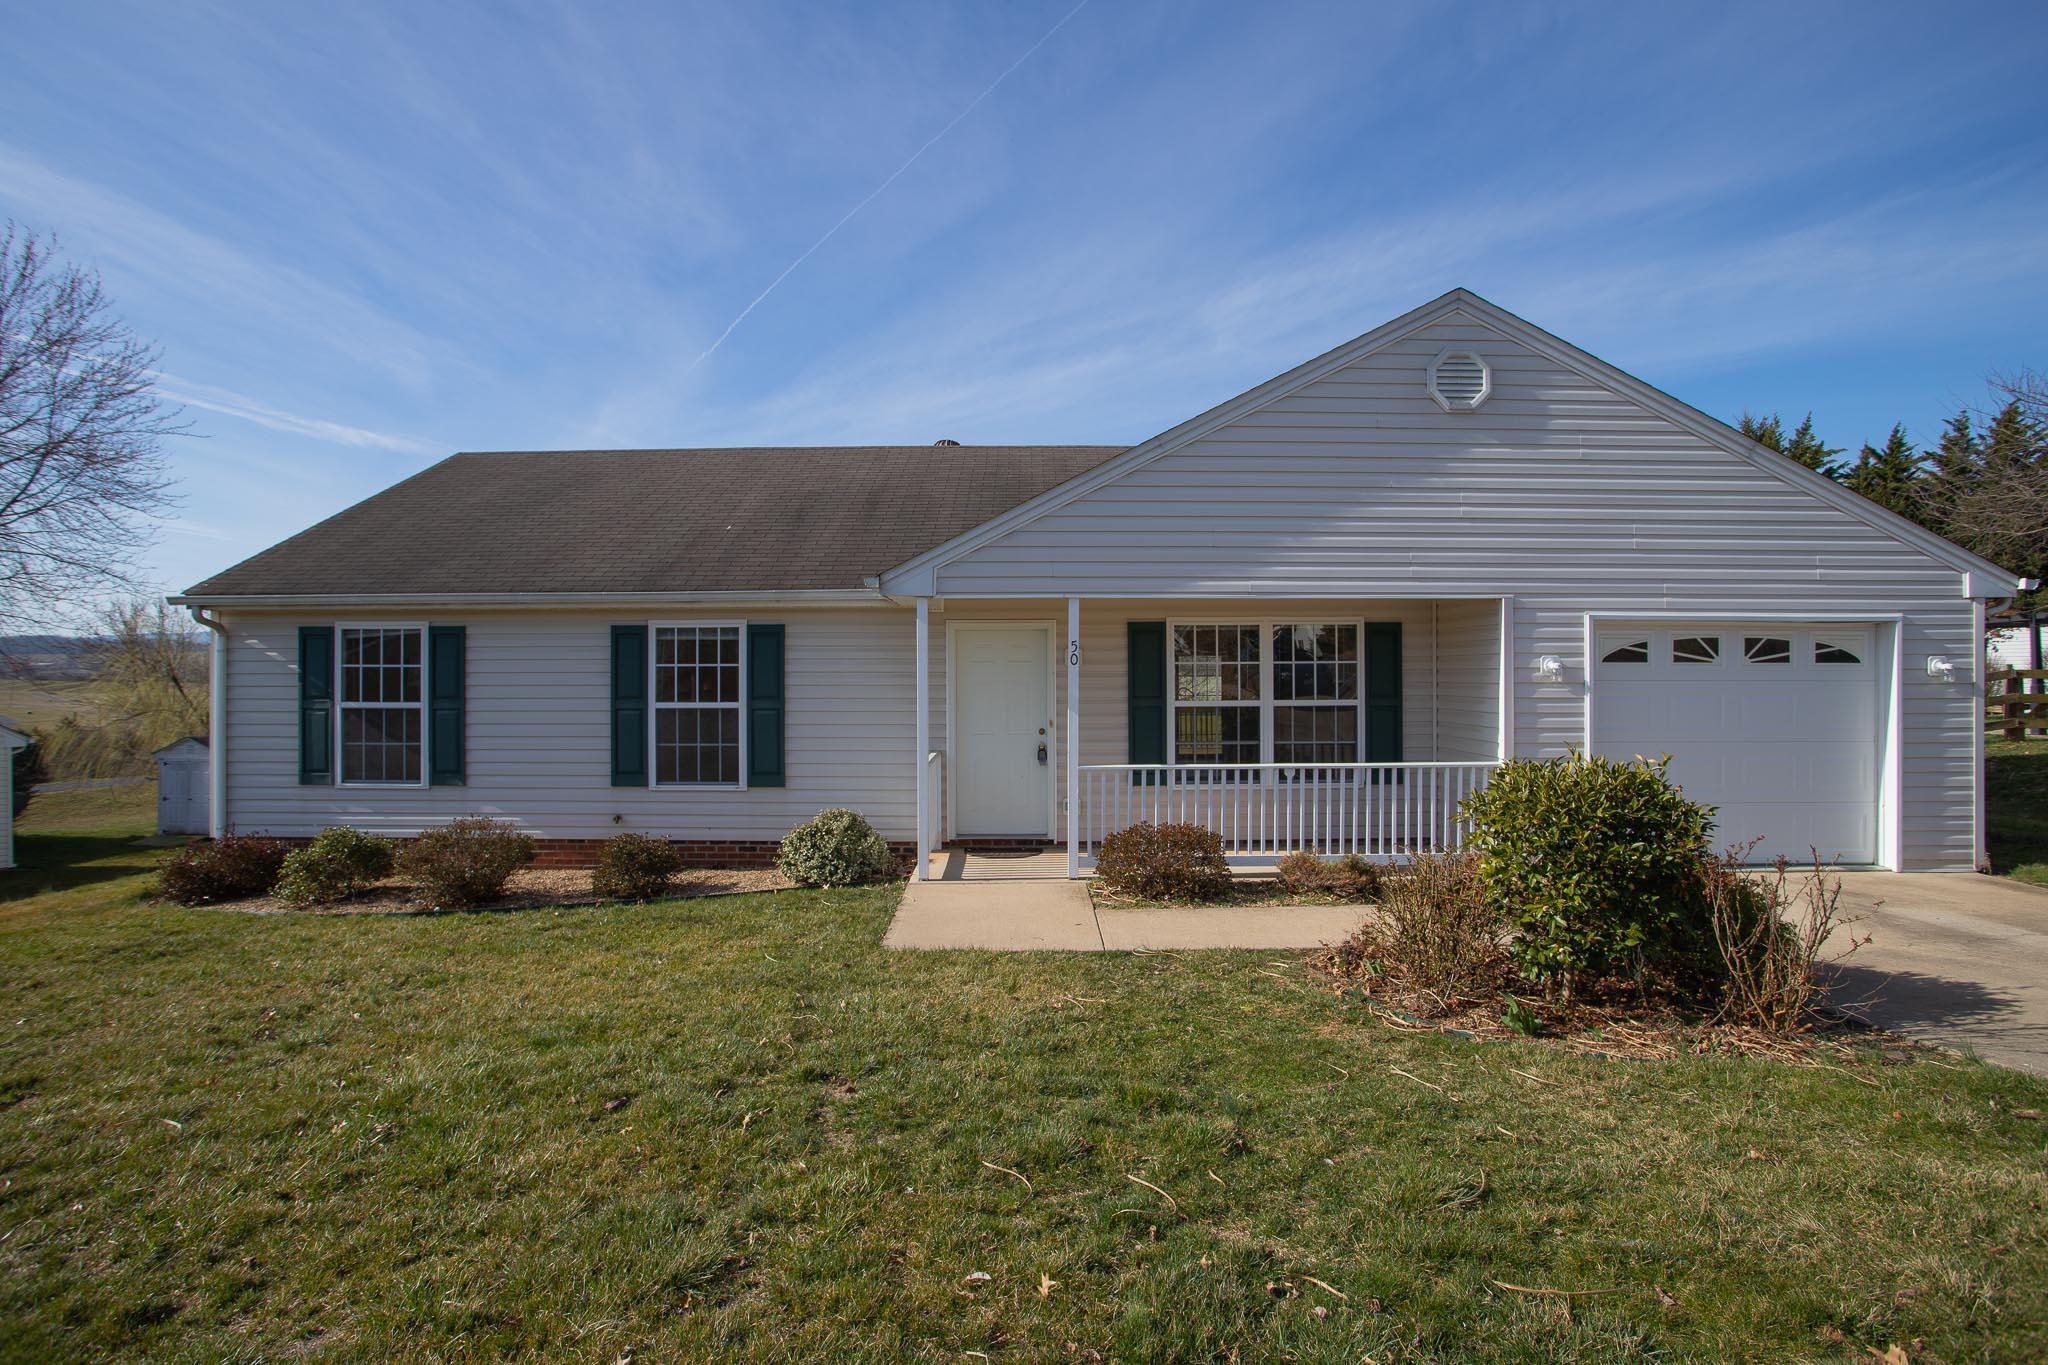 Home for Sale in Stuarts Draft, 50 Harrogate Drive